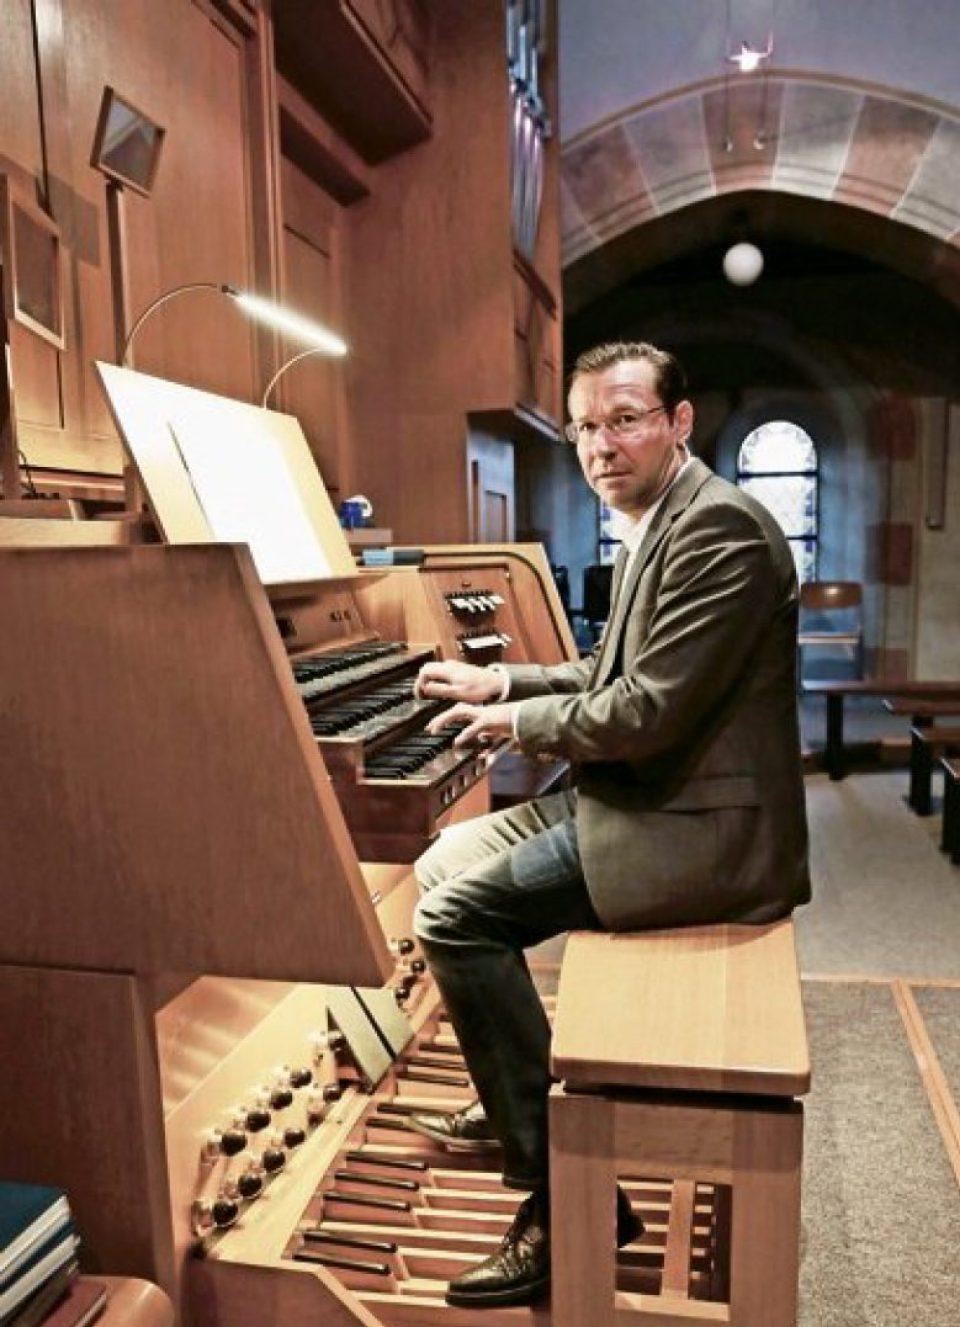 http://www.musik-st-georg.ch/wp-content/uploads/2016/11/Kantor-und-Organist-Andreas-Gut-e1480023623657-960x1327_c.jpg